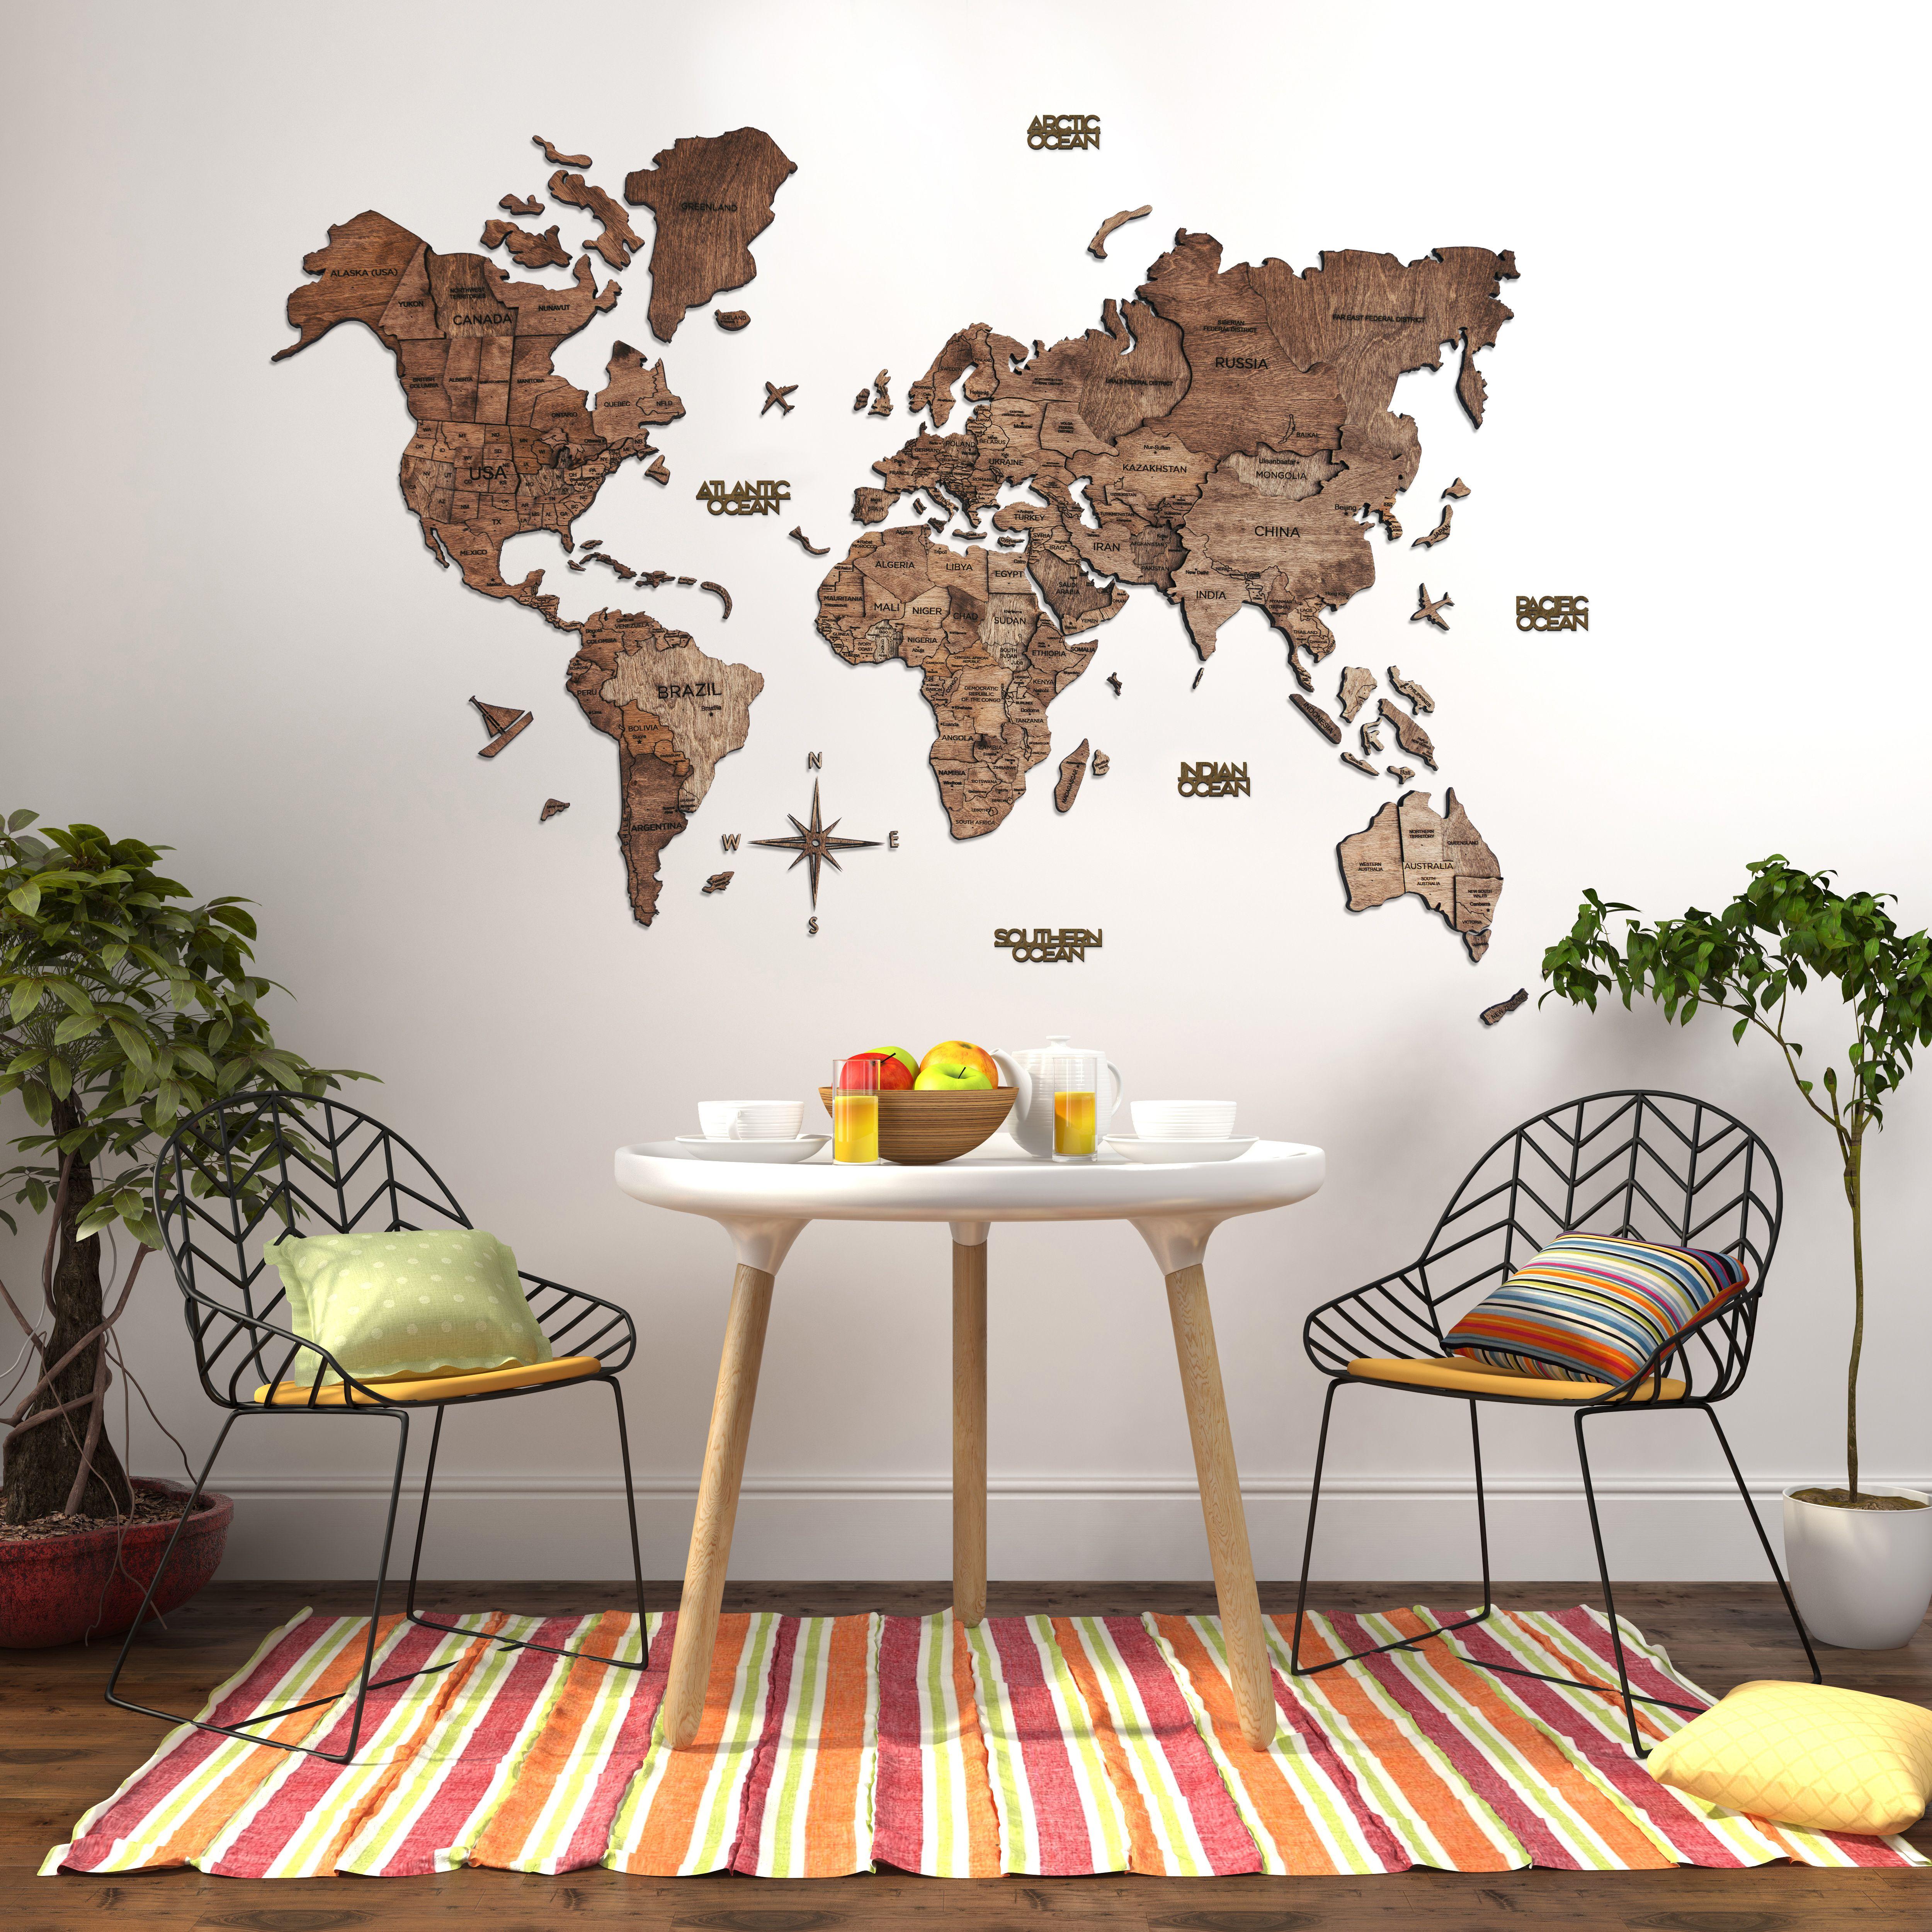 3d weltkarte walnuss in 2021 world map wall decor wood rustic wanddekoration mit kompass rund